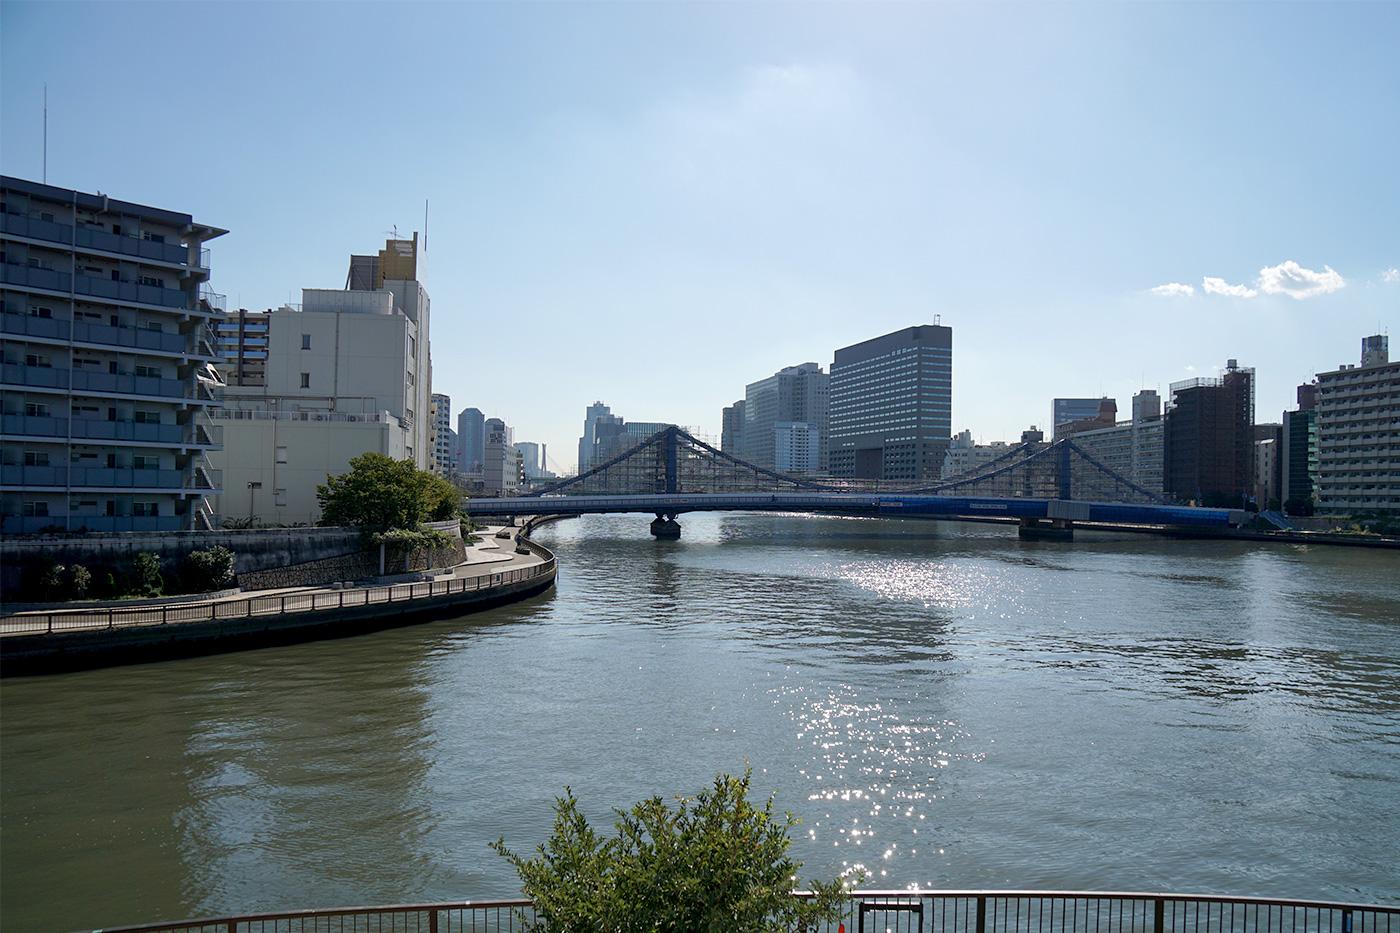 画像 隅田川と小名木川の合流地点